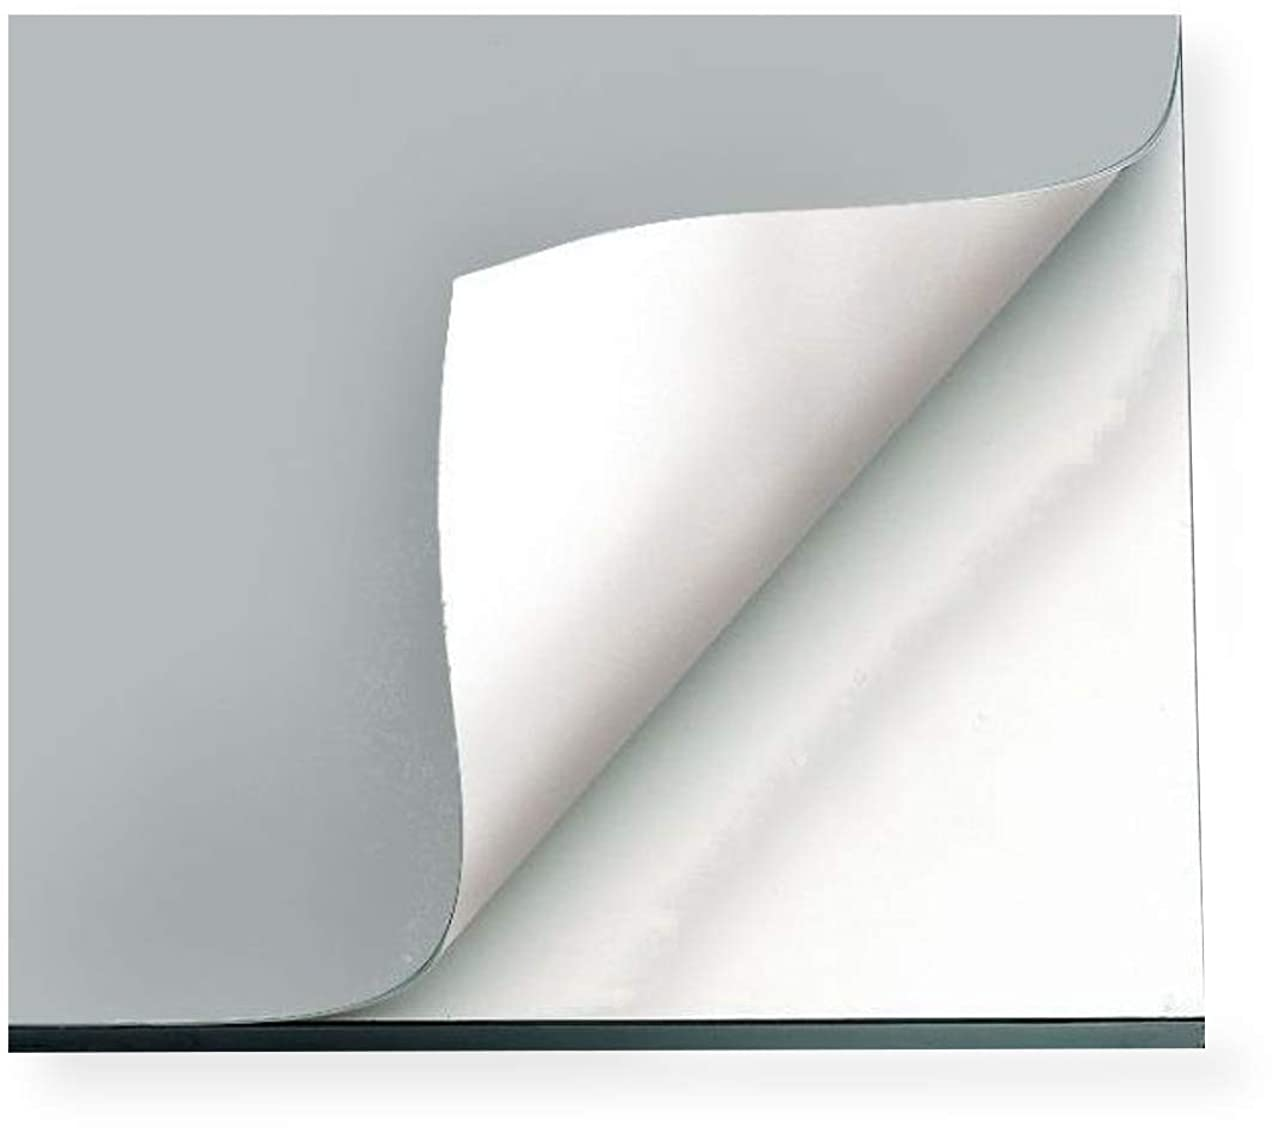 Alvin VBC77-8 Vyco Sheet, Gray/White, 38 x 60-Inch